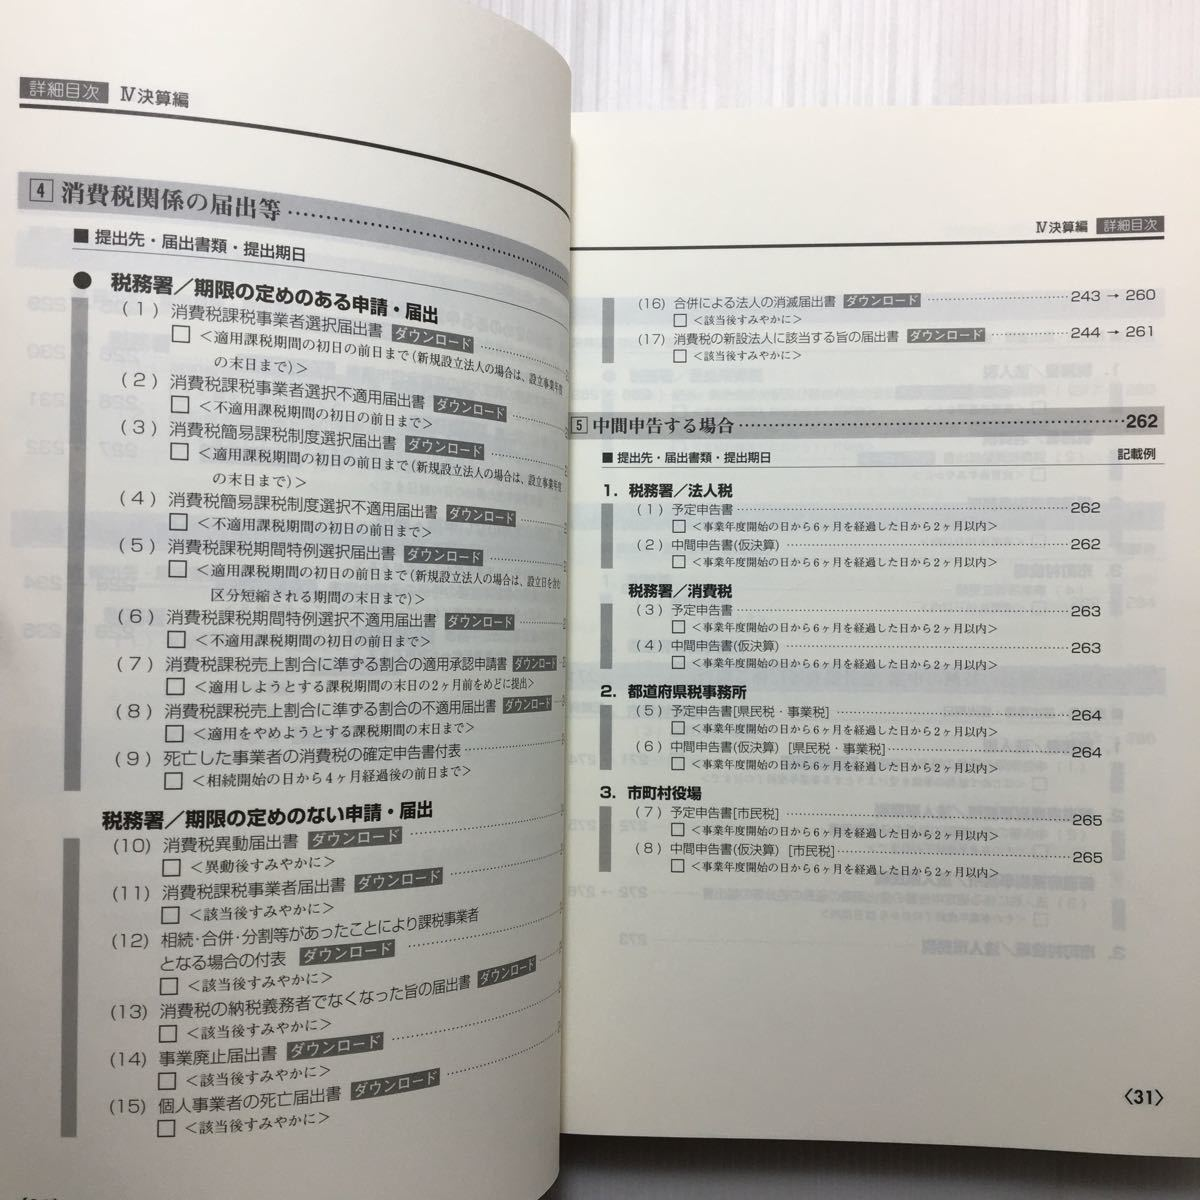 zaa-109♪実務家・専門家のための事例別総務・税務手続マニュアル―なにを?いつまで? 困ったときの便利帳 2002/7/1 井上 修 (著)他